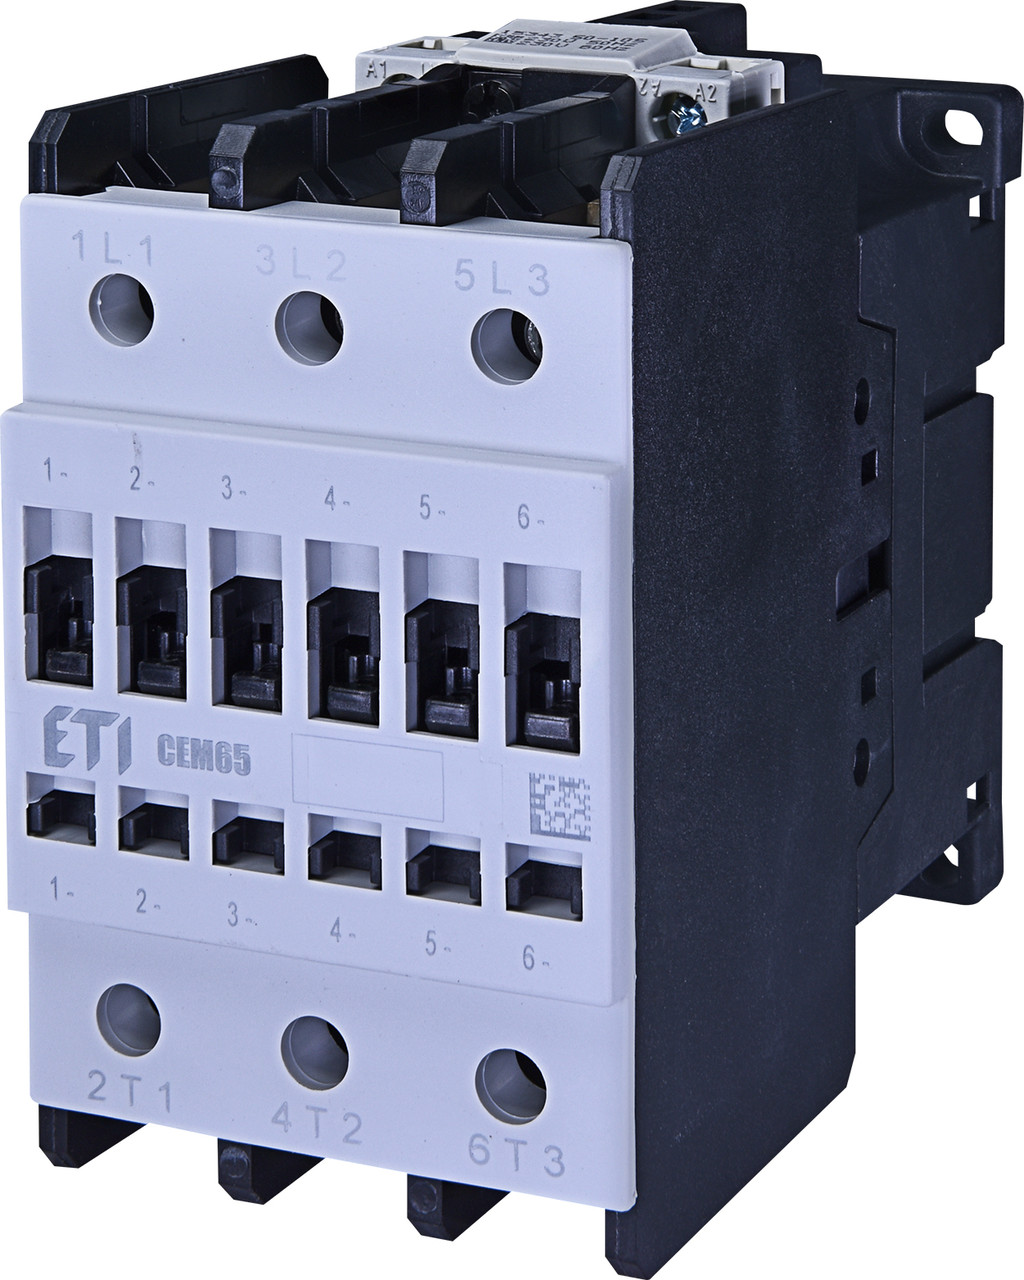 Контактор силовой ETI CEM 65.00 65А 230V AC 3NO 30kW 4649103 (на DIN-рейку, 110A AC1, 65A AC3)